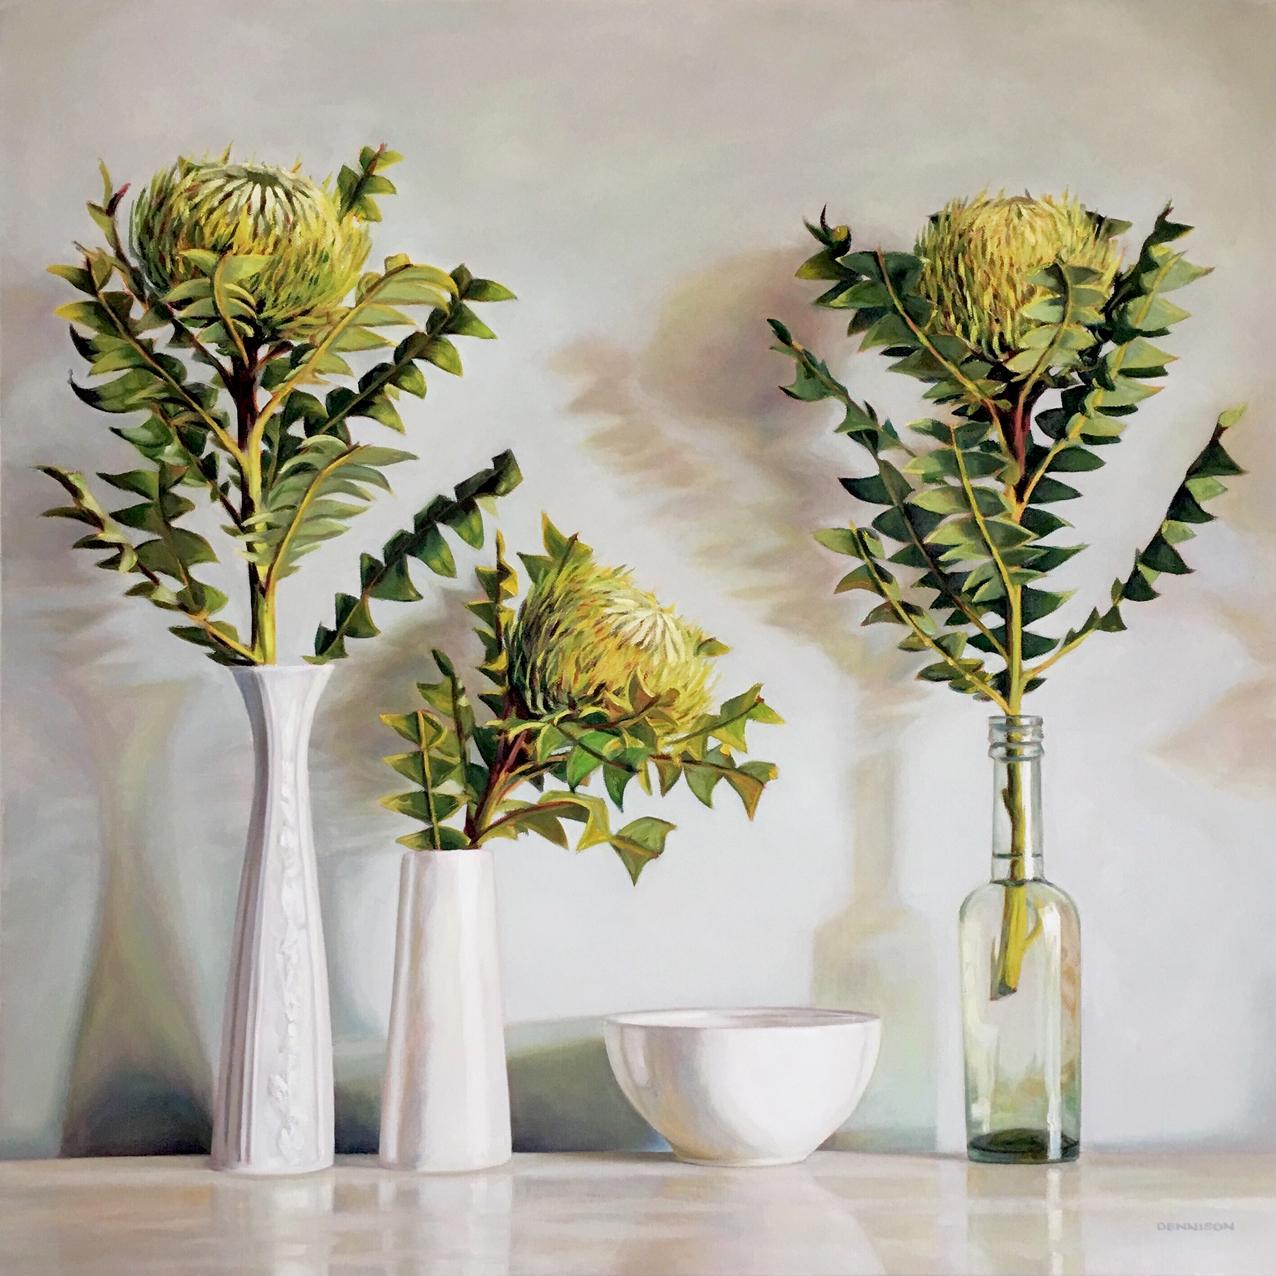 Banksia Baxteri Still Life   Oil on Canvas, 70cm x 70cm